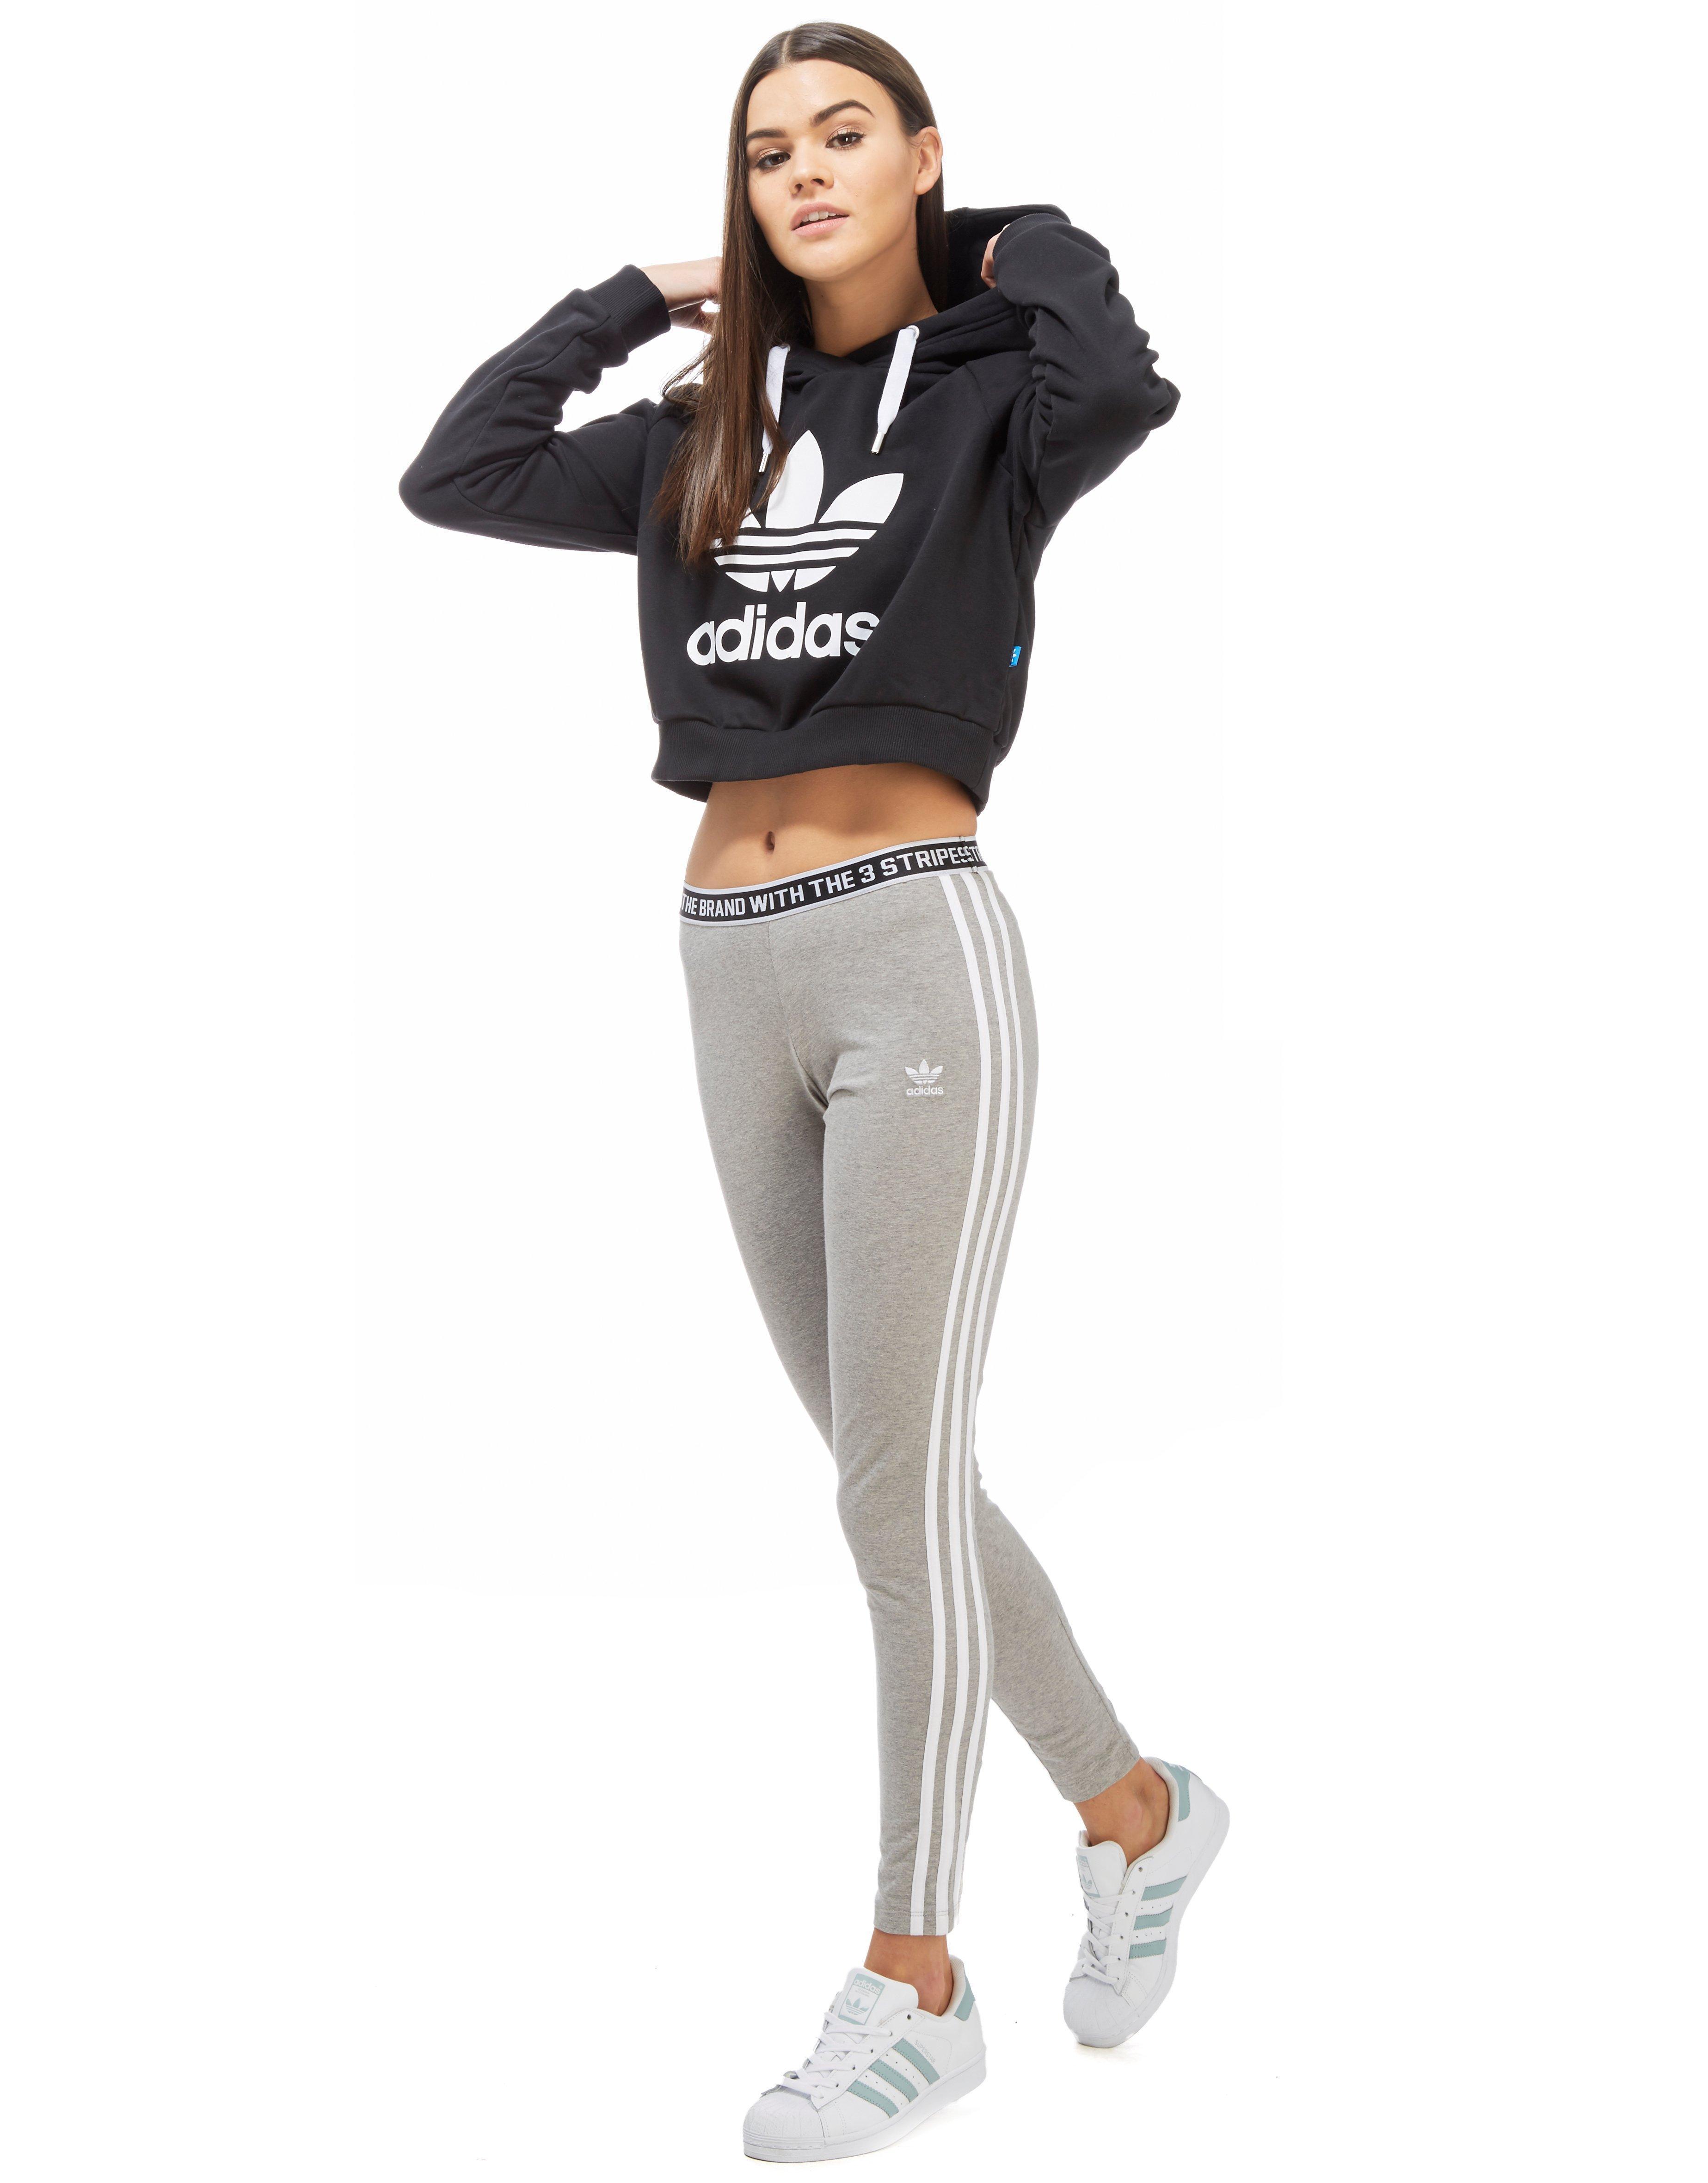 buy online b4446 8c96a Lyst - adidas Originals Trefoil Crop Hoody in Black